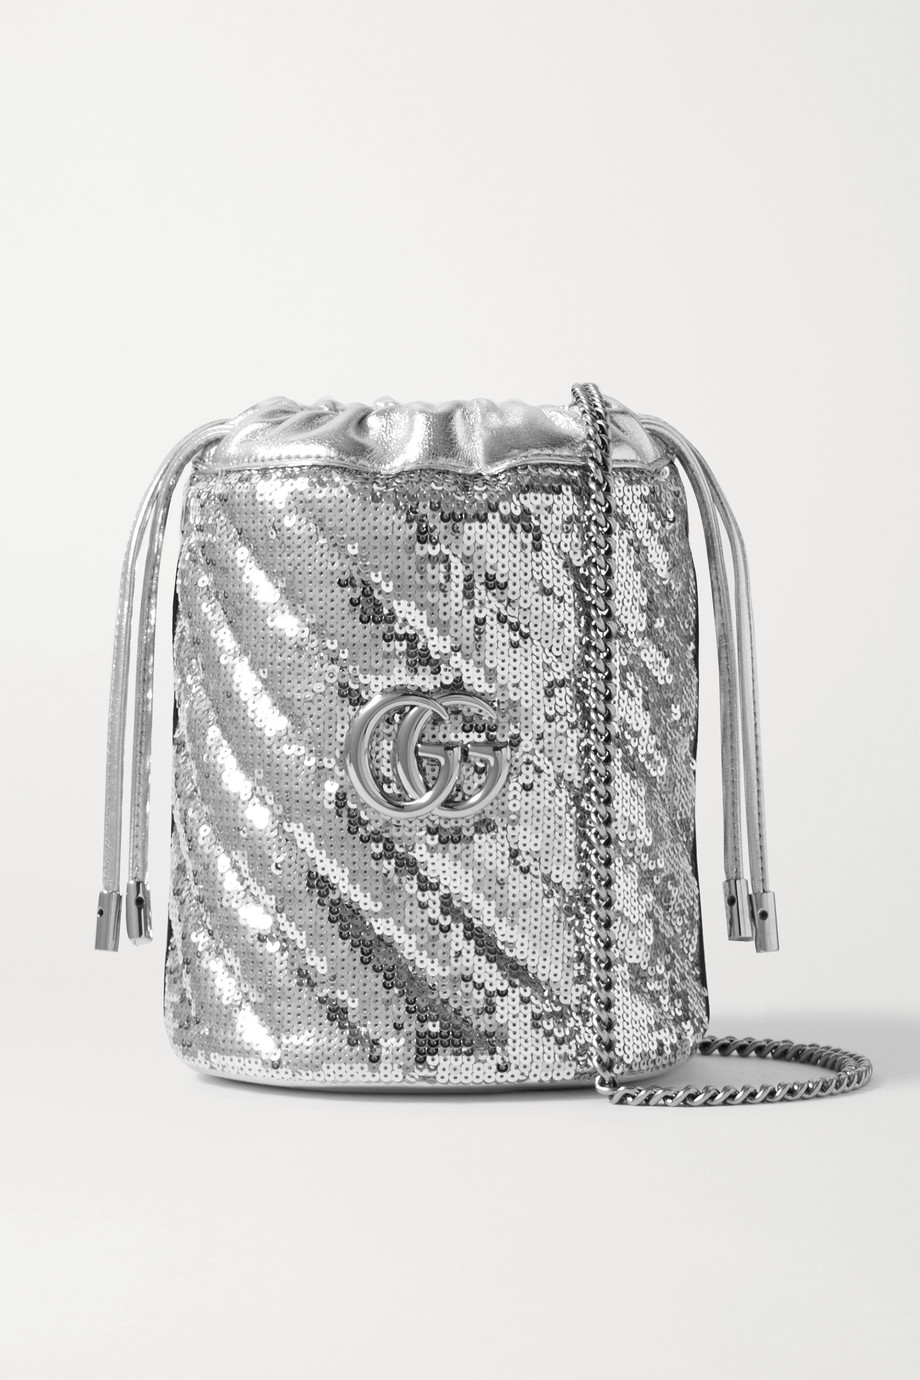 Gucci GG Marmont mini Beuteltasche aus Leder mit Pailletten